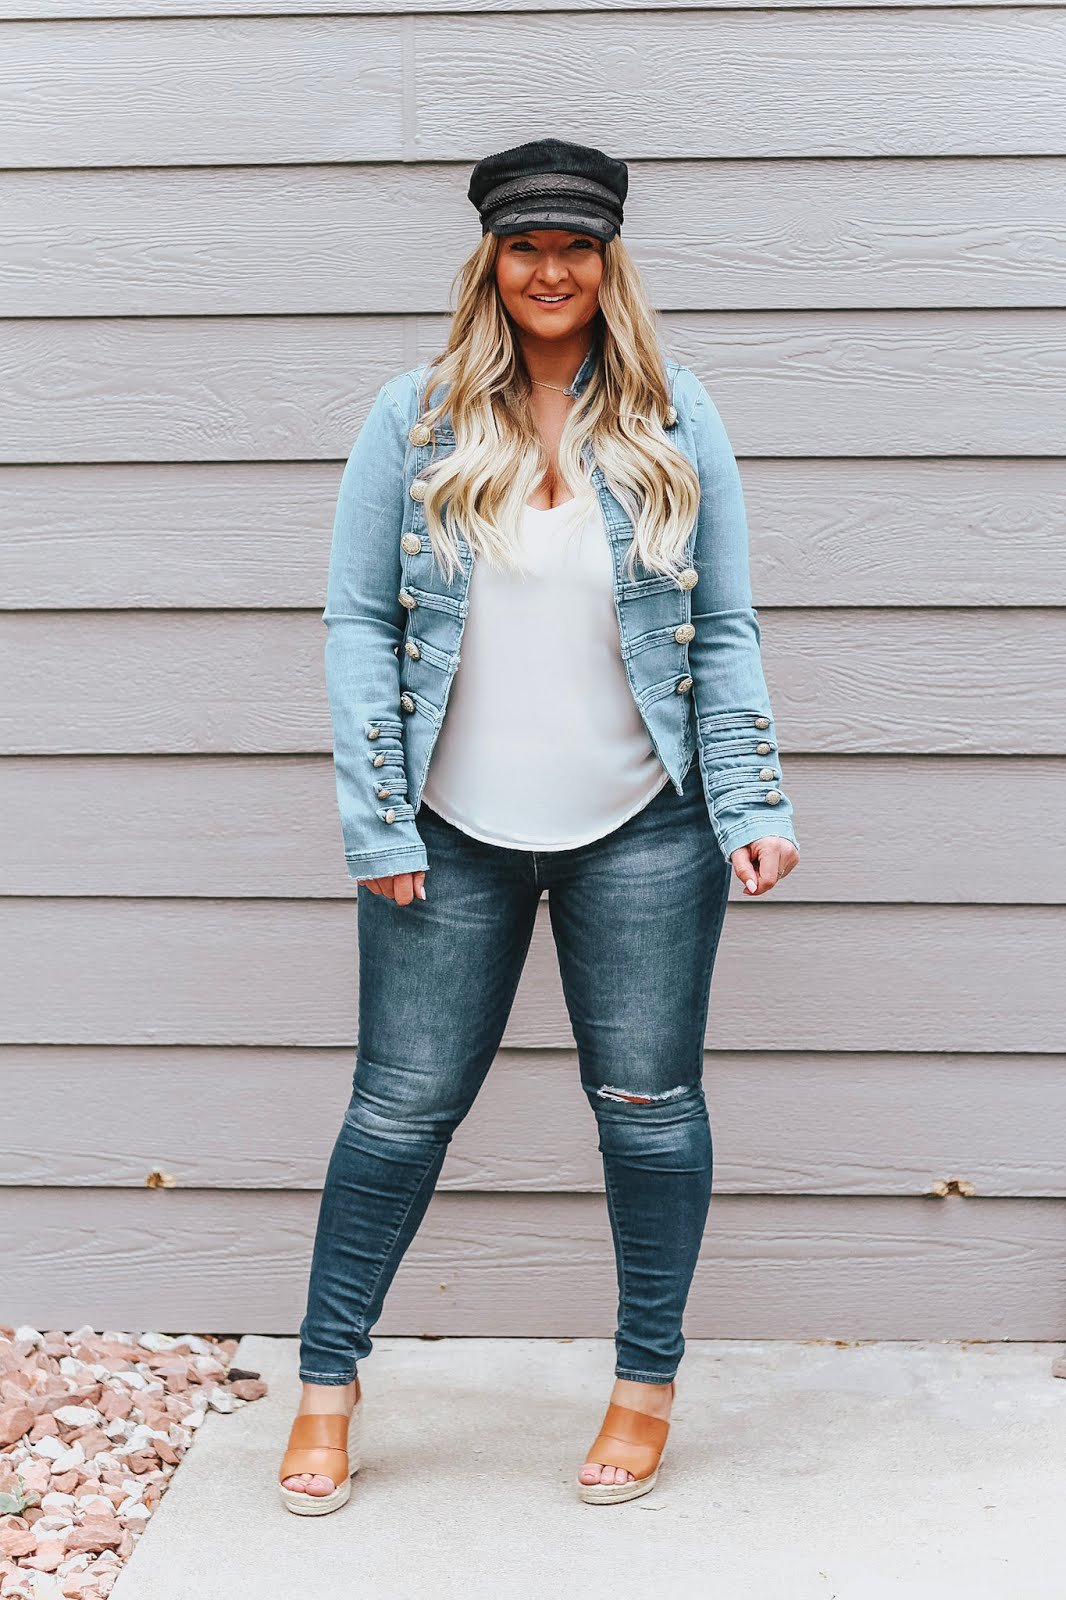 Denim on Denim outfit featured on top Denver fashion blog, Delayna Denaye